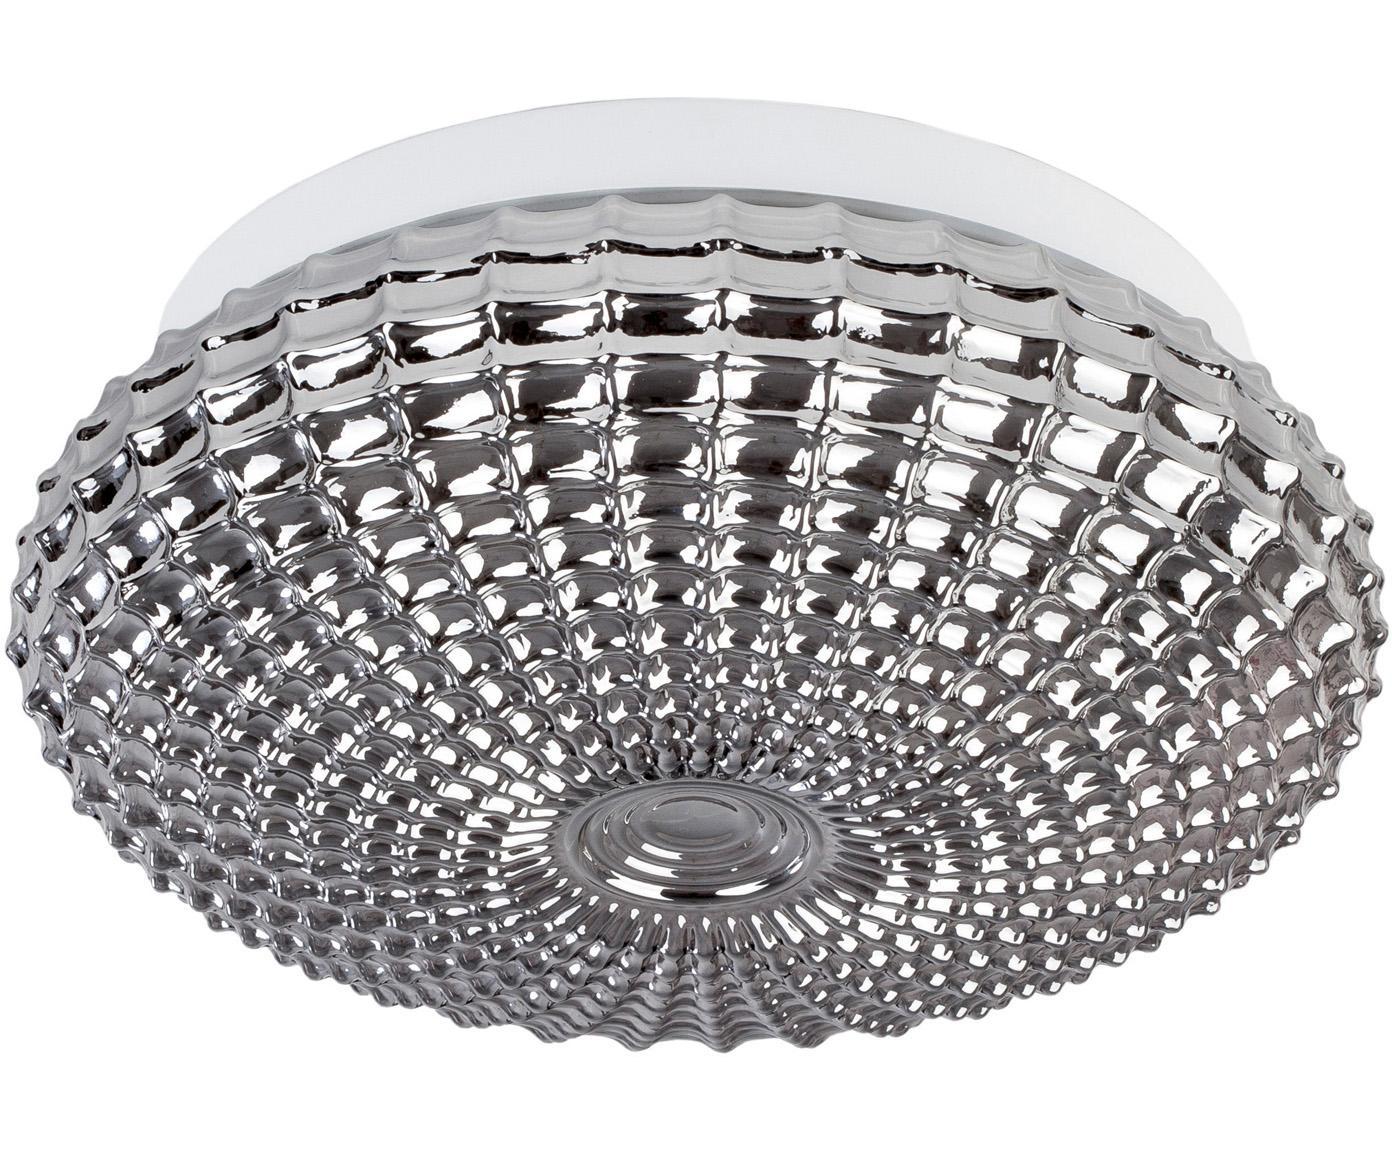 Dimbare plafondlamp Clam van glas, Lampenkap: glas, Baldakijn: gecoat staal, Chroomkleurig, wit, Ø 30 x H 12 cm